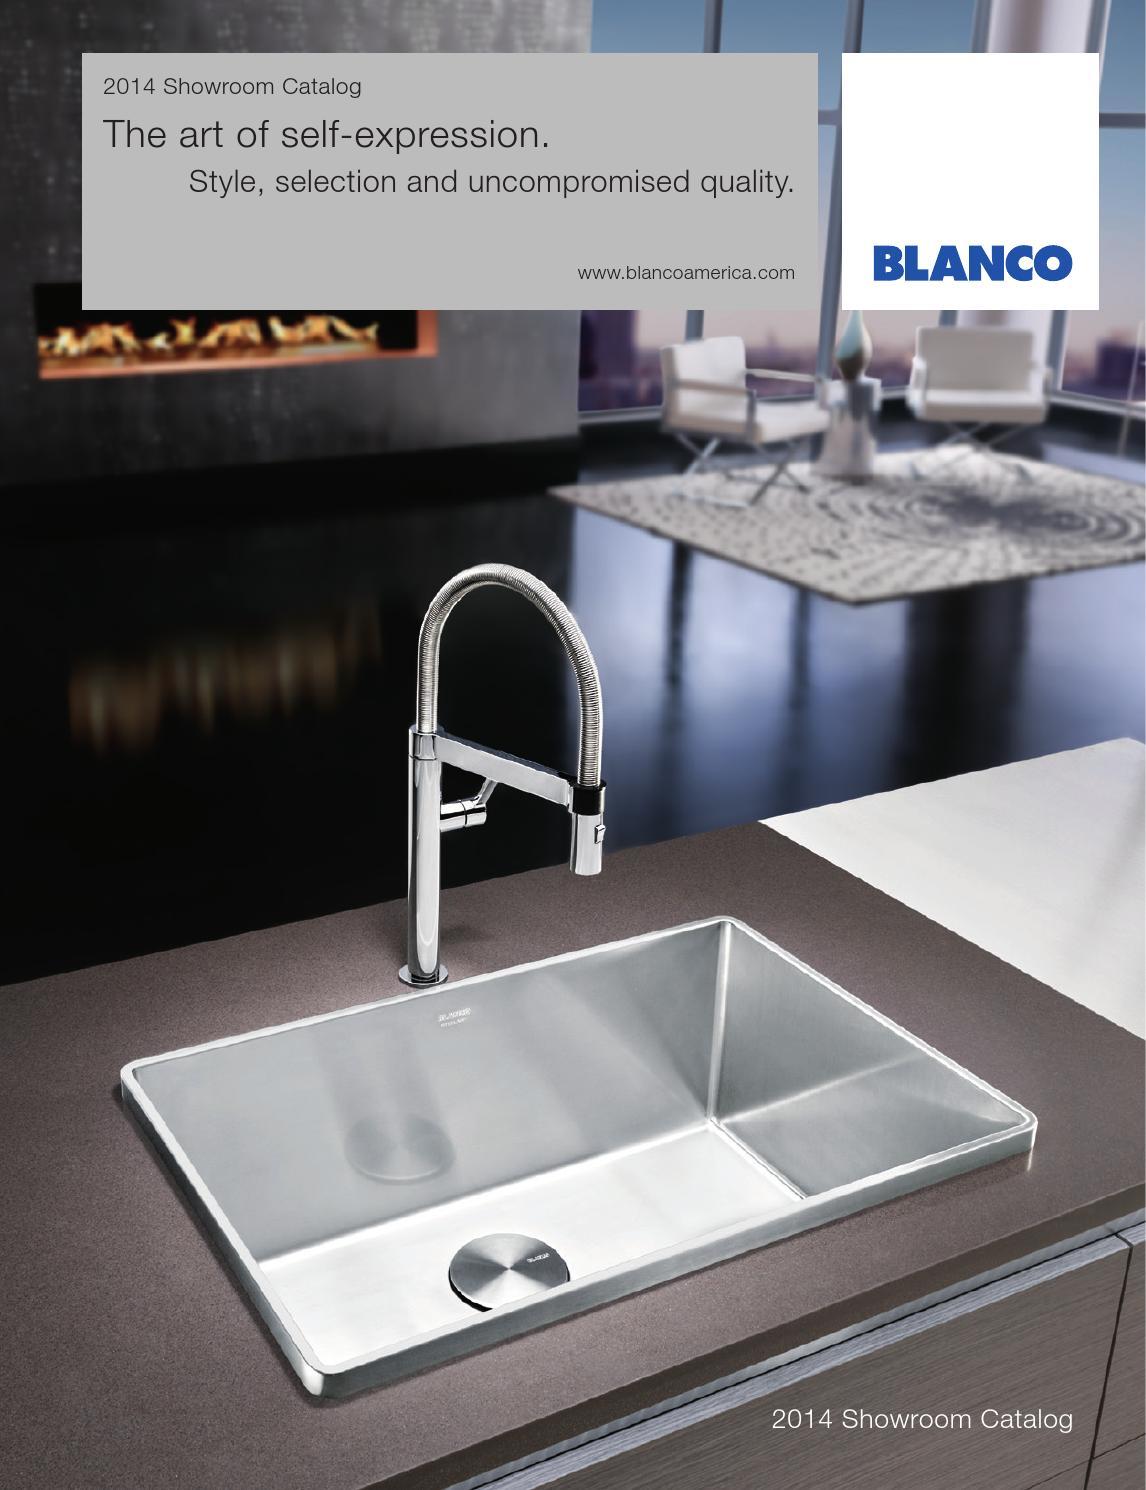 Blanco 2014 showroom catalog by blanco issuu for Blancoamerica com kitchen sinks